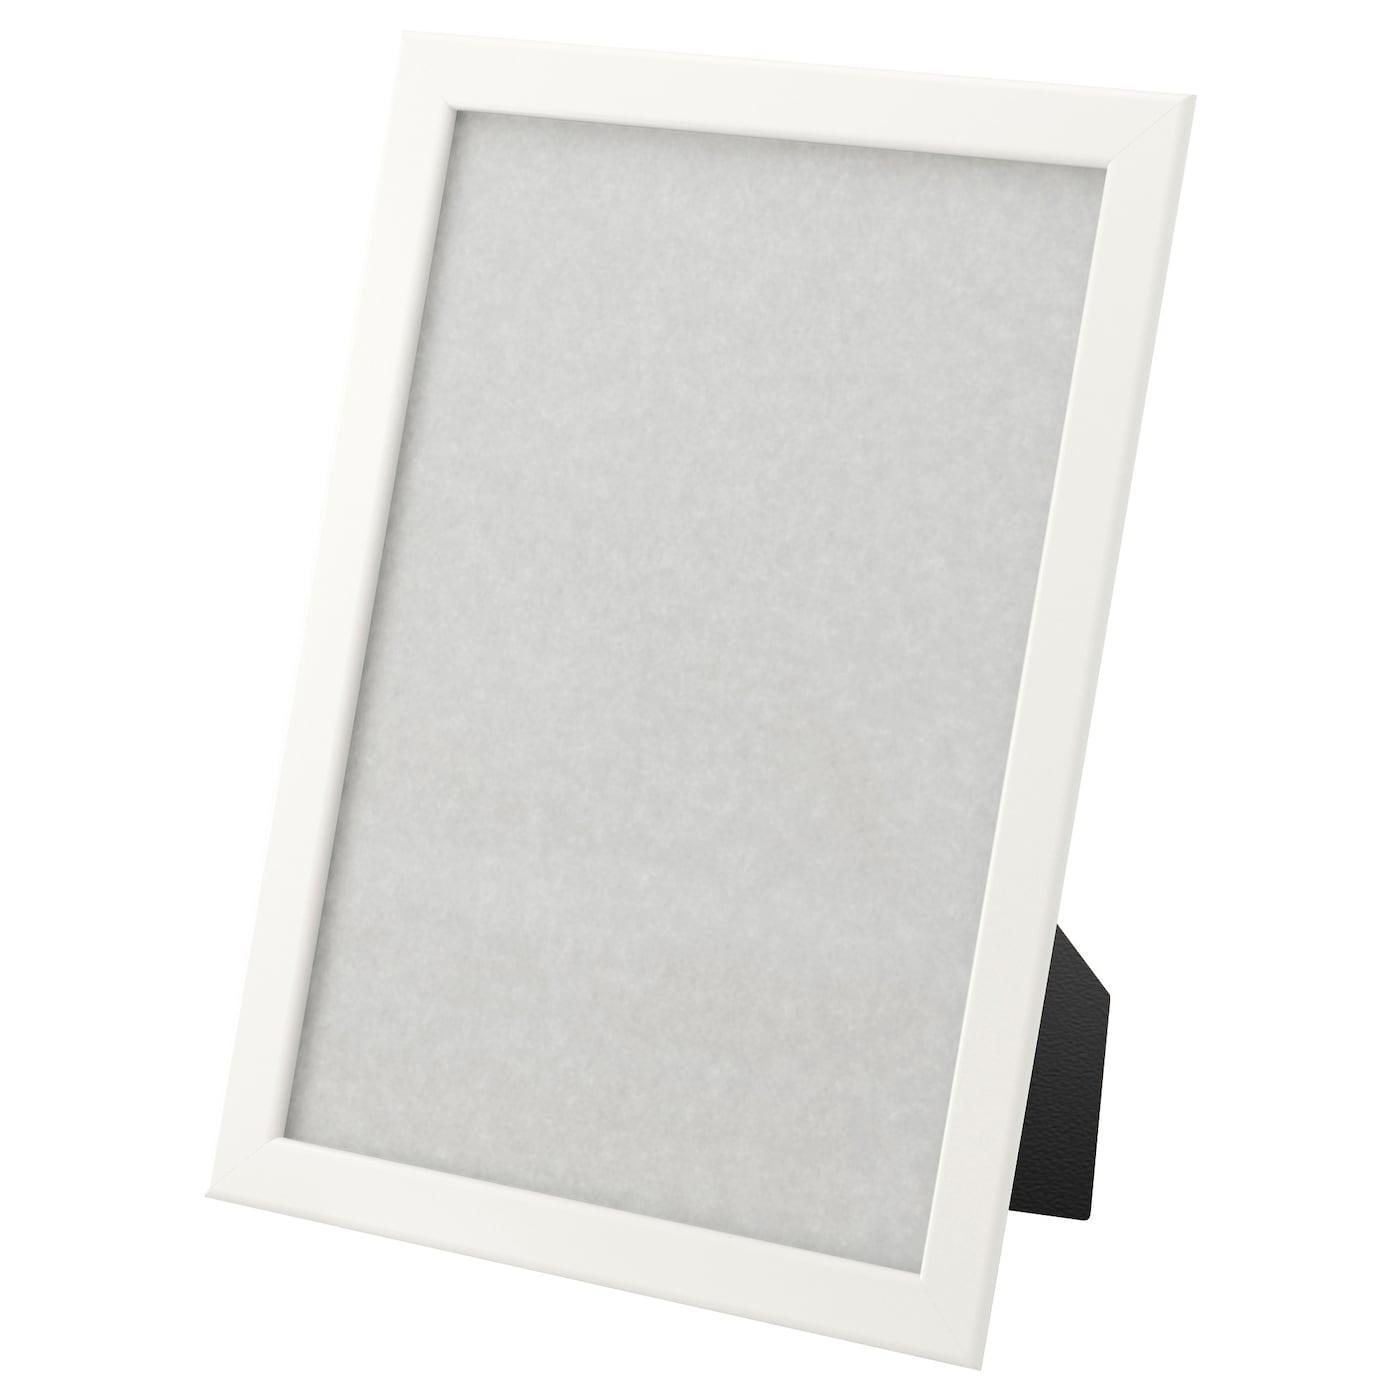 fiskbo frame white 21 x 30 cm ikea. Black Bedroom Furniture Sets. Home Design Ideas